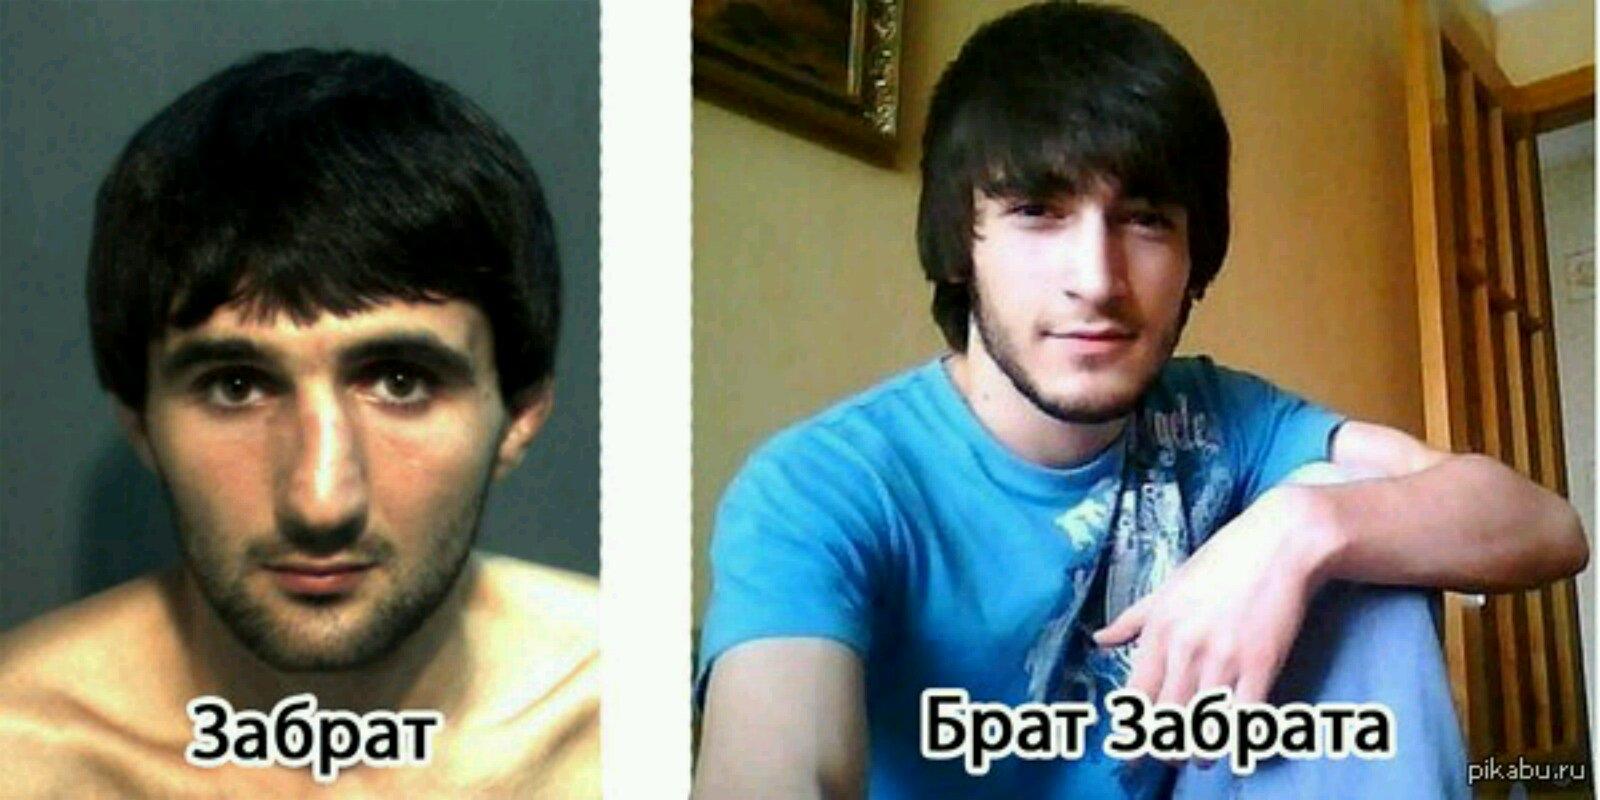 Секс кавказца с русским, Кавказское порно онлайн, кавказские девушки на 24 видео 24 фотография